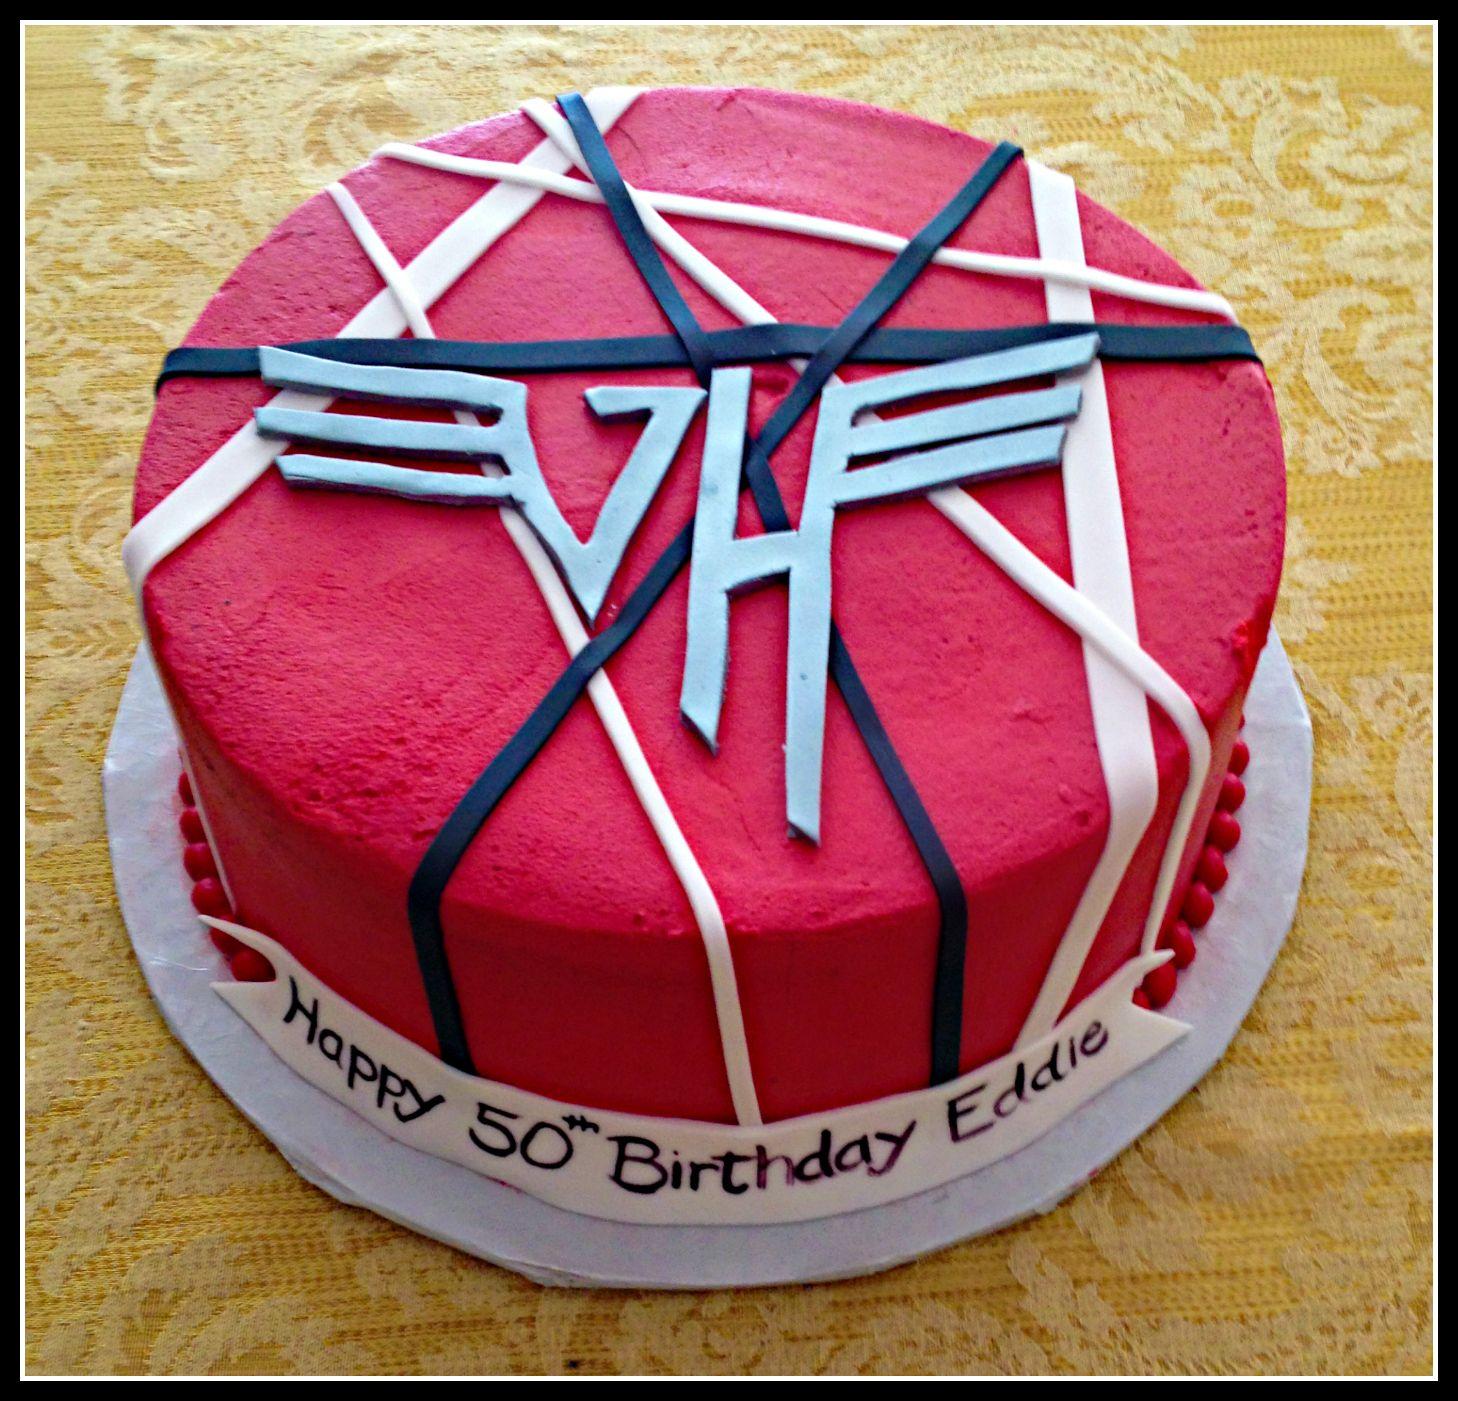 Van Halen 50th Birthday Cake I Love My Wife And Daughter Funny Birthday Cakes Cake No Bake Cake